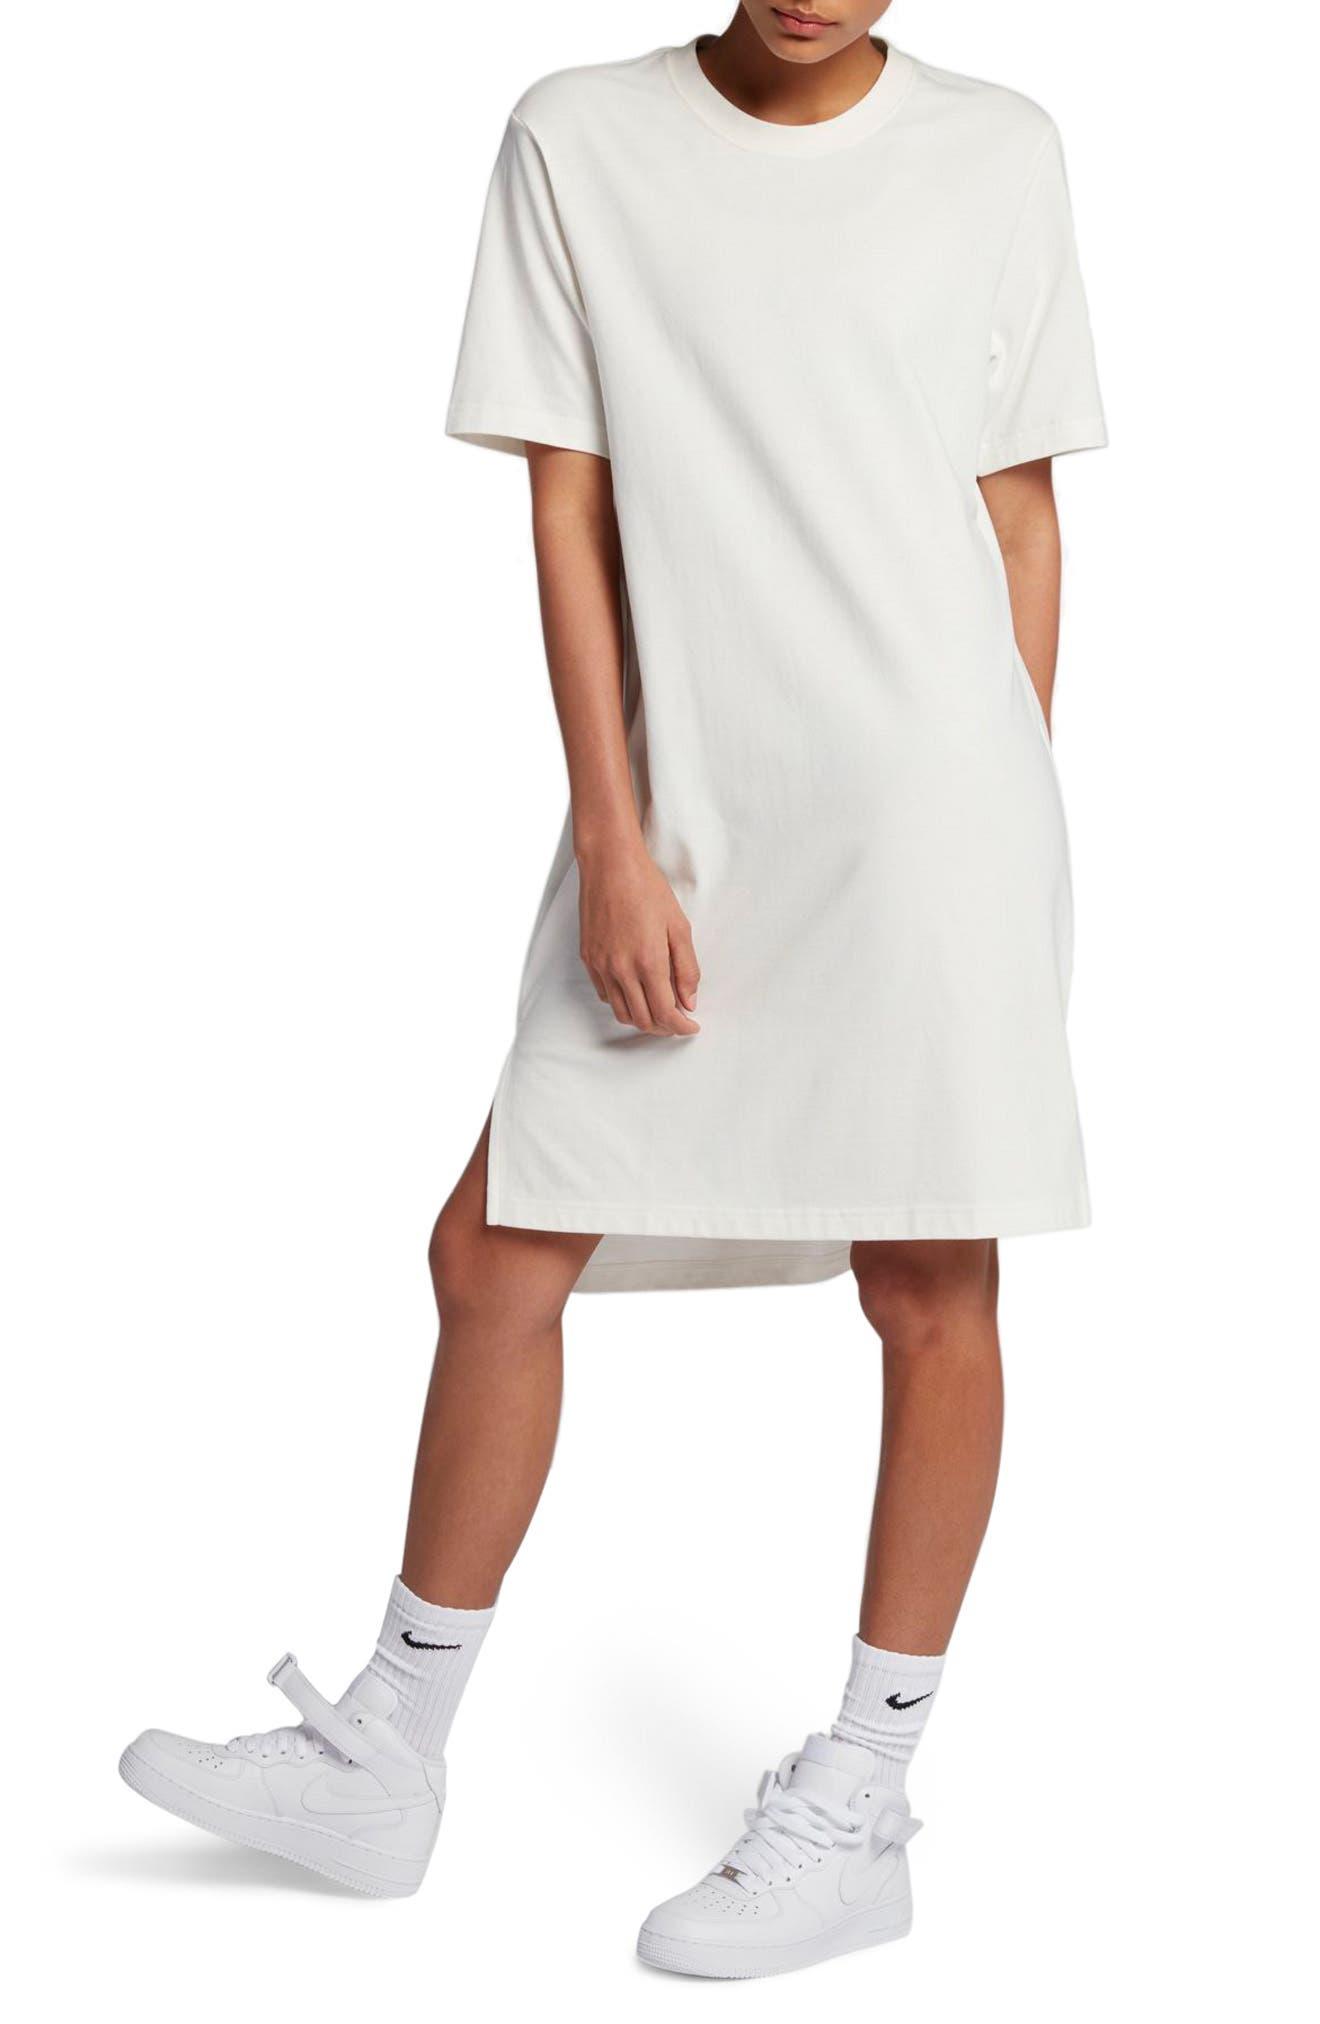 Alternate Image 1 Selected - Nike NikeLab Essentials T-Shirt Dress